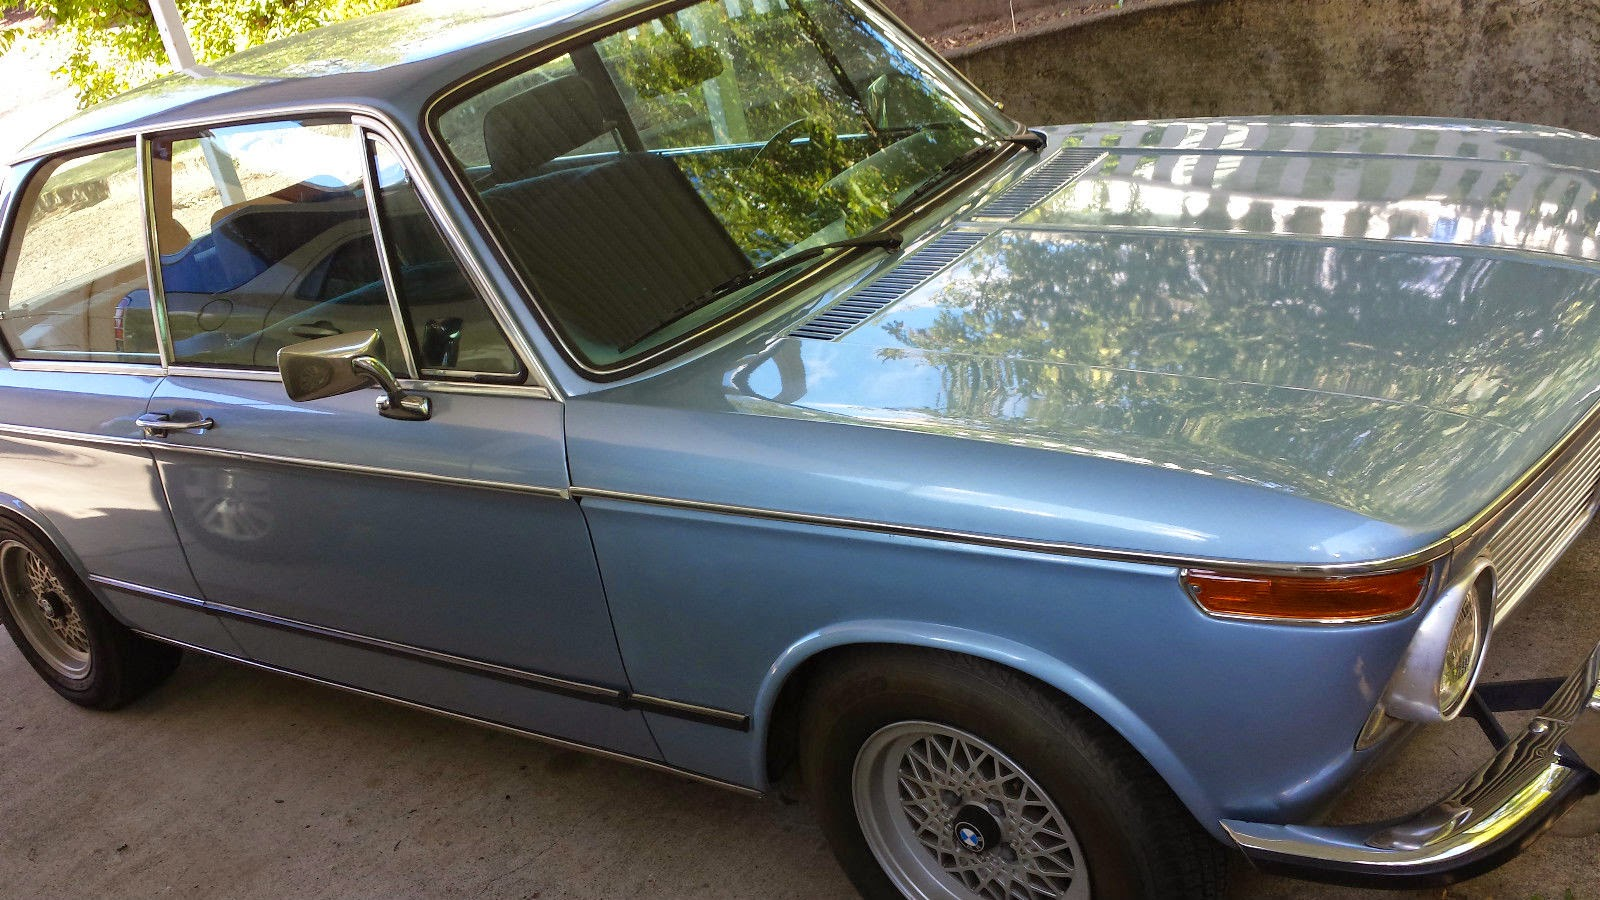 Daily Turismo K Affordable Classic BMW Tii - 1972 bmw 2002 tii